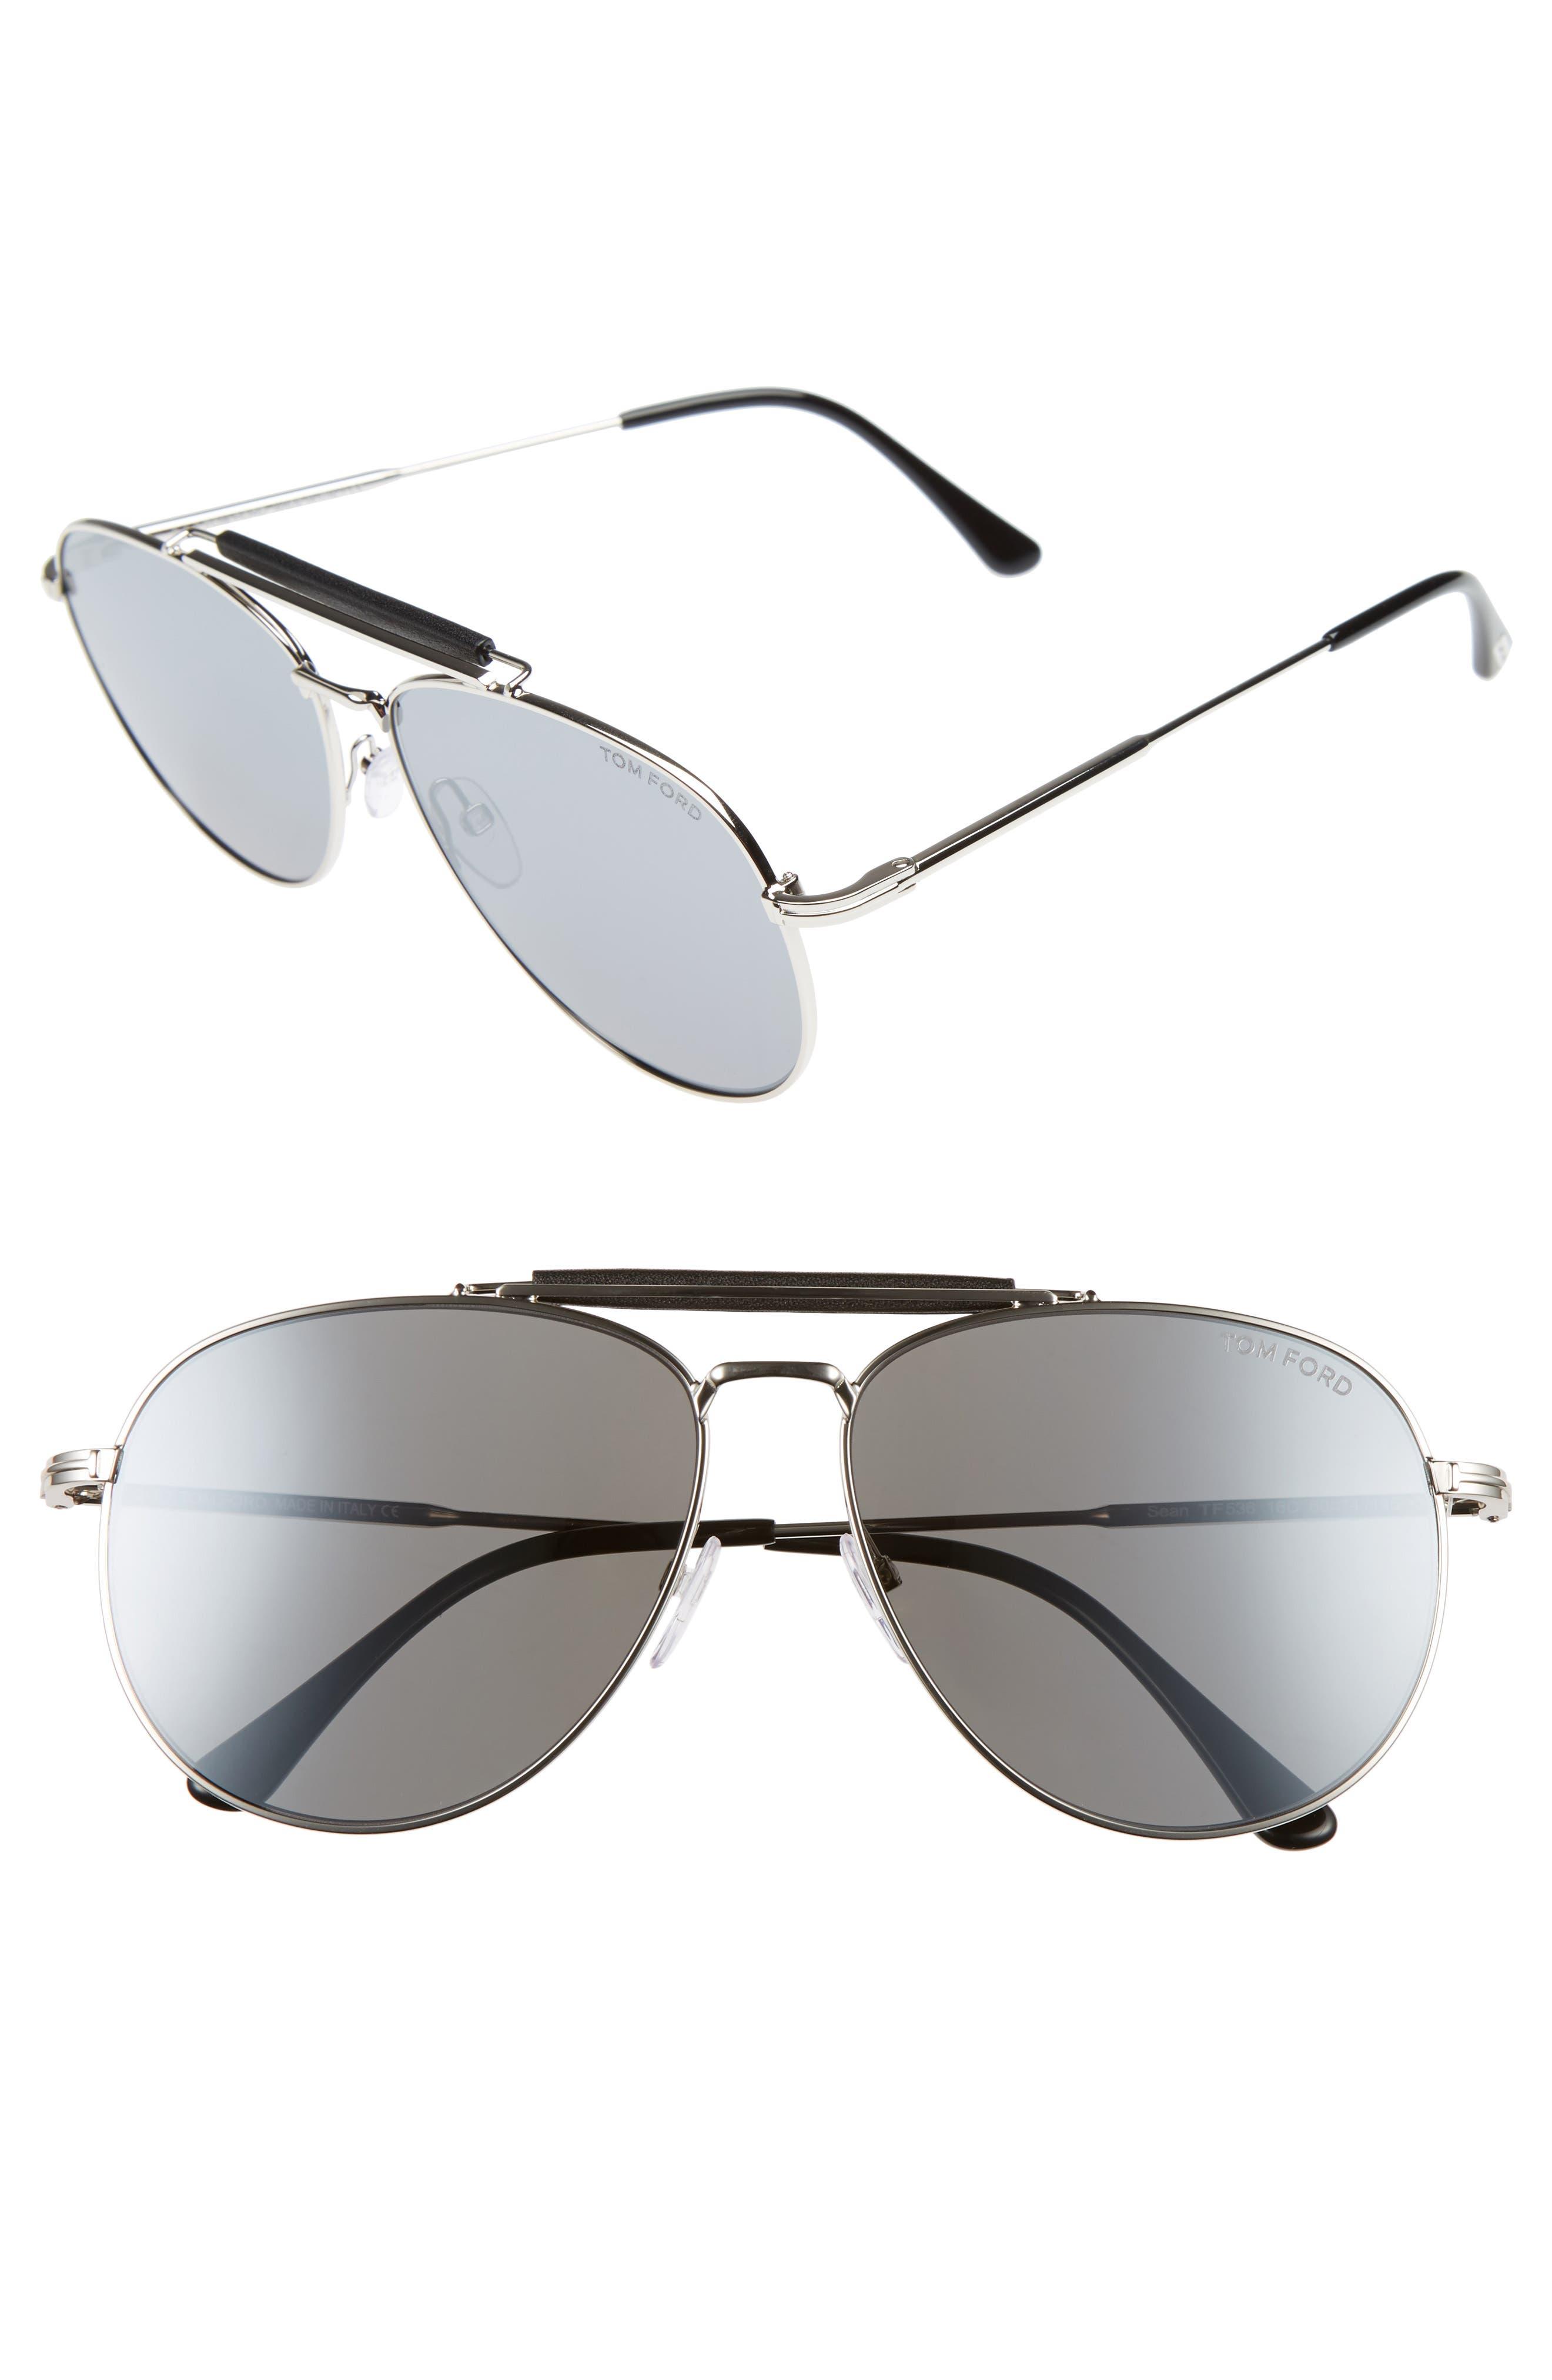 Sean 61mm Aviator Sunglasses,                         Main,                         color, SHINY PALLADIUM / SMOKE MIRROR